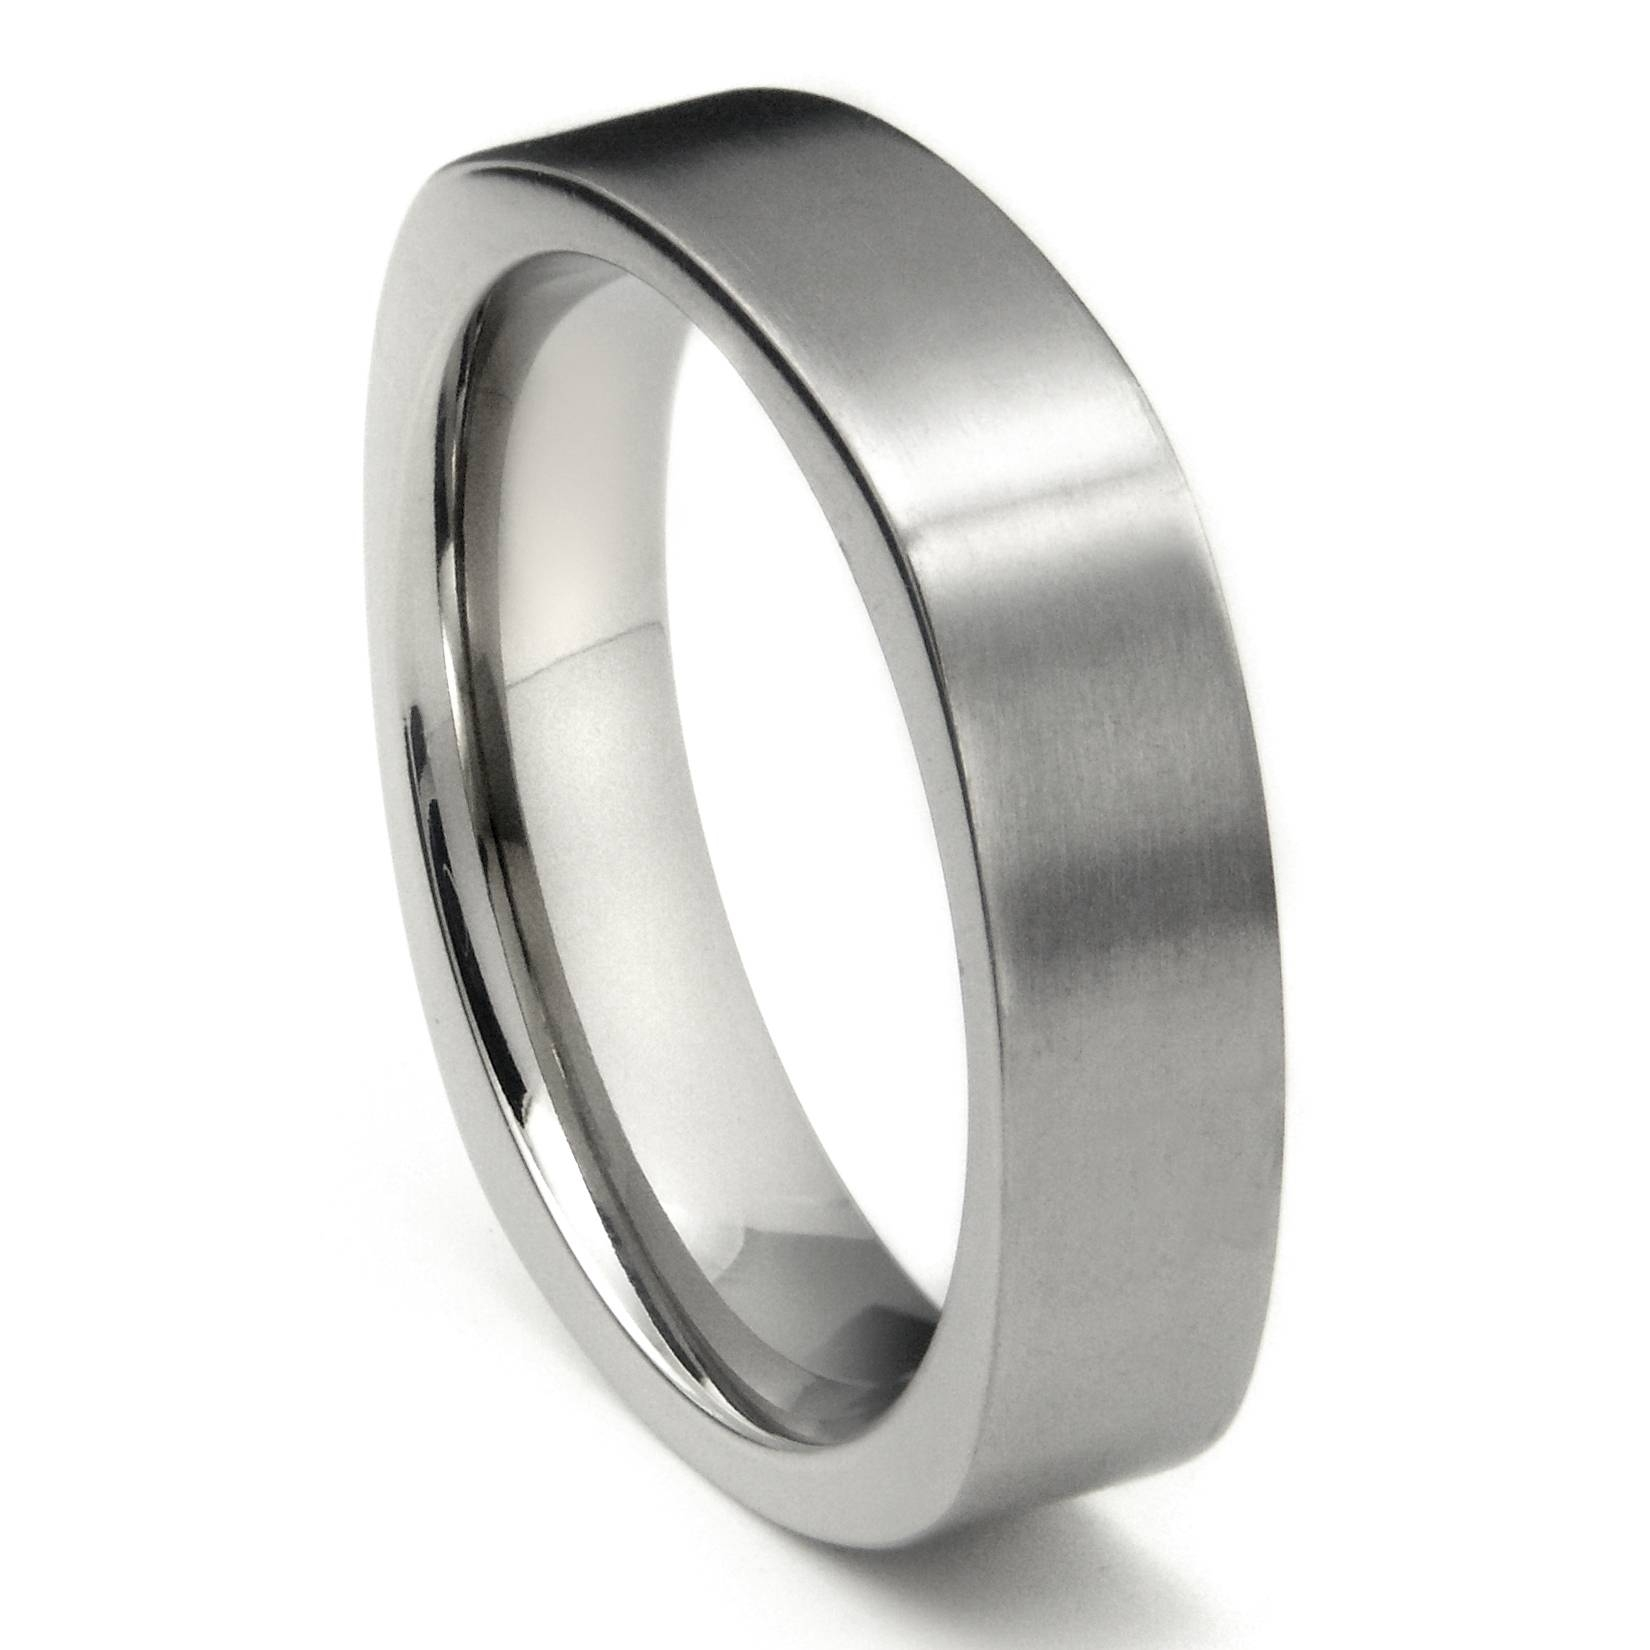 Titanium 6mm Satin Finish Square Wedding Band Ring Regarding Square Wedding Bands (View 4 of 15)